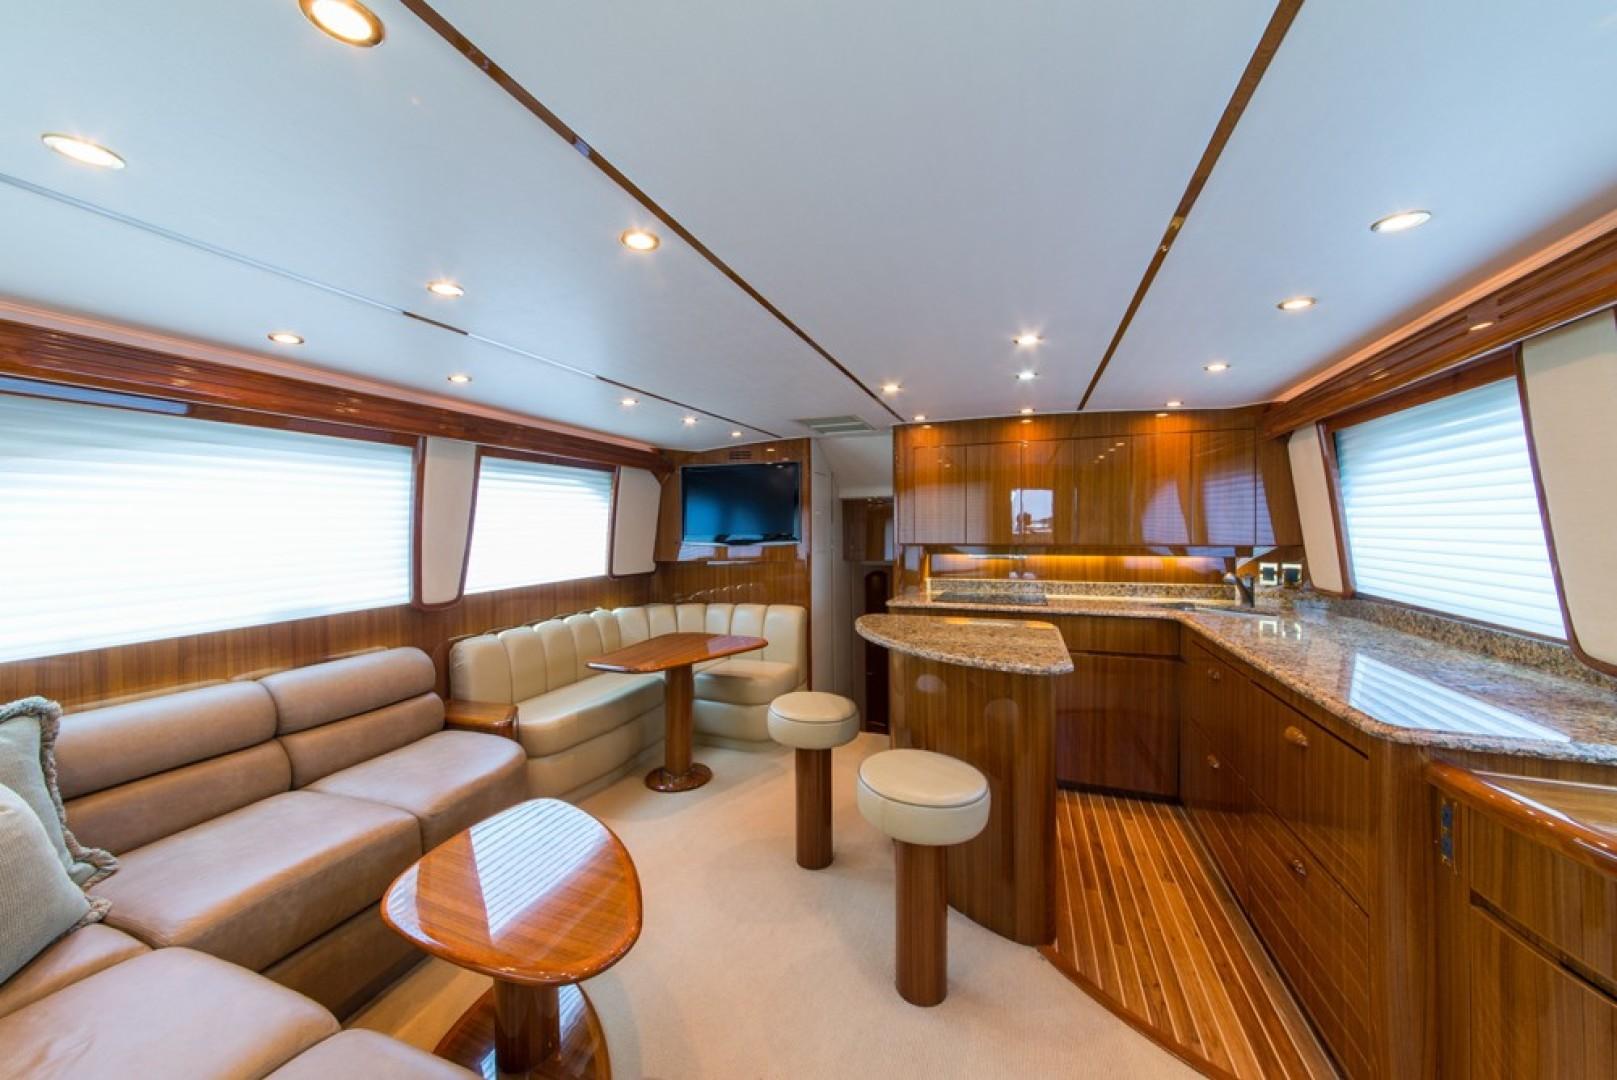 Viking 50 - SEA N DOUBLE - Salon